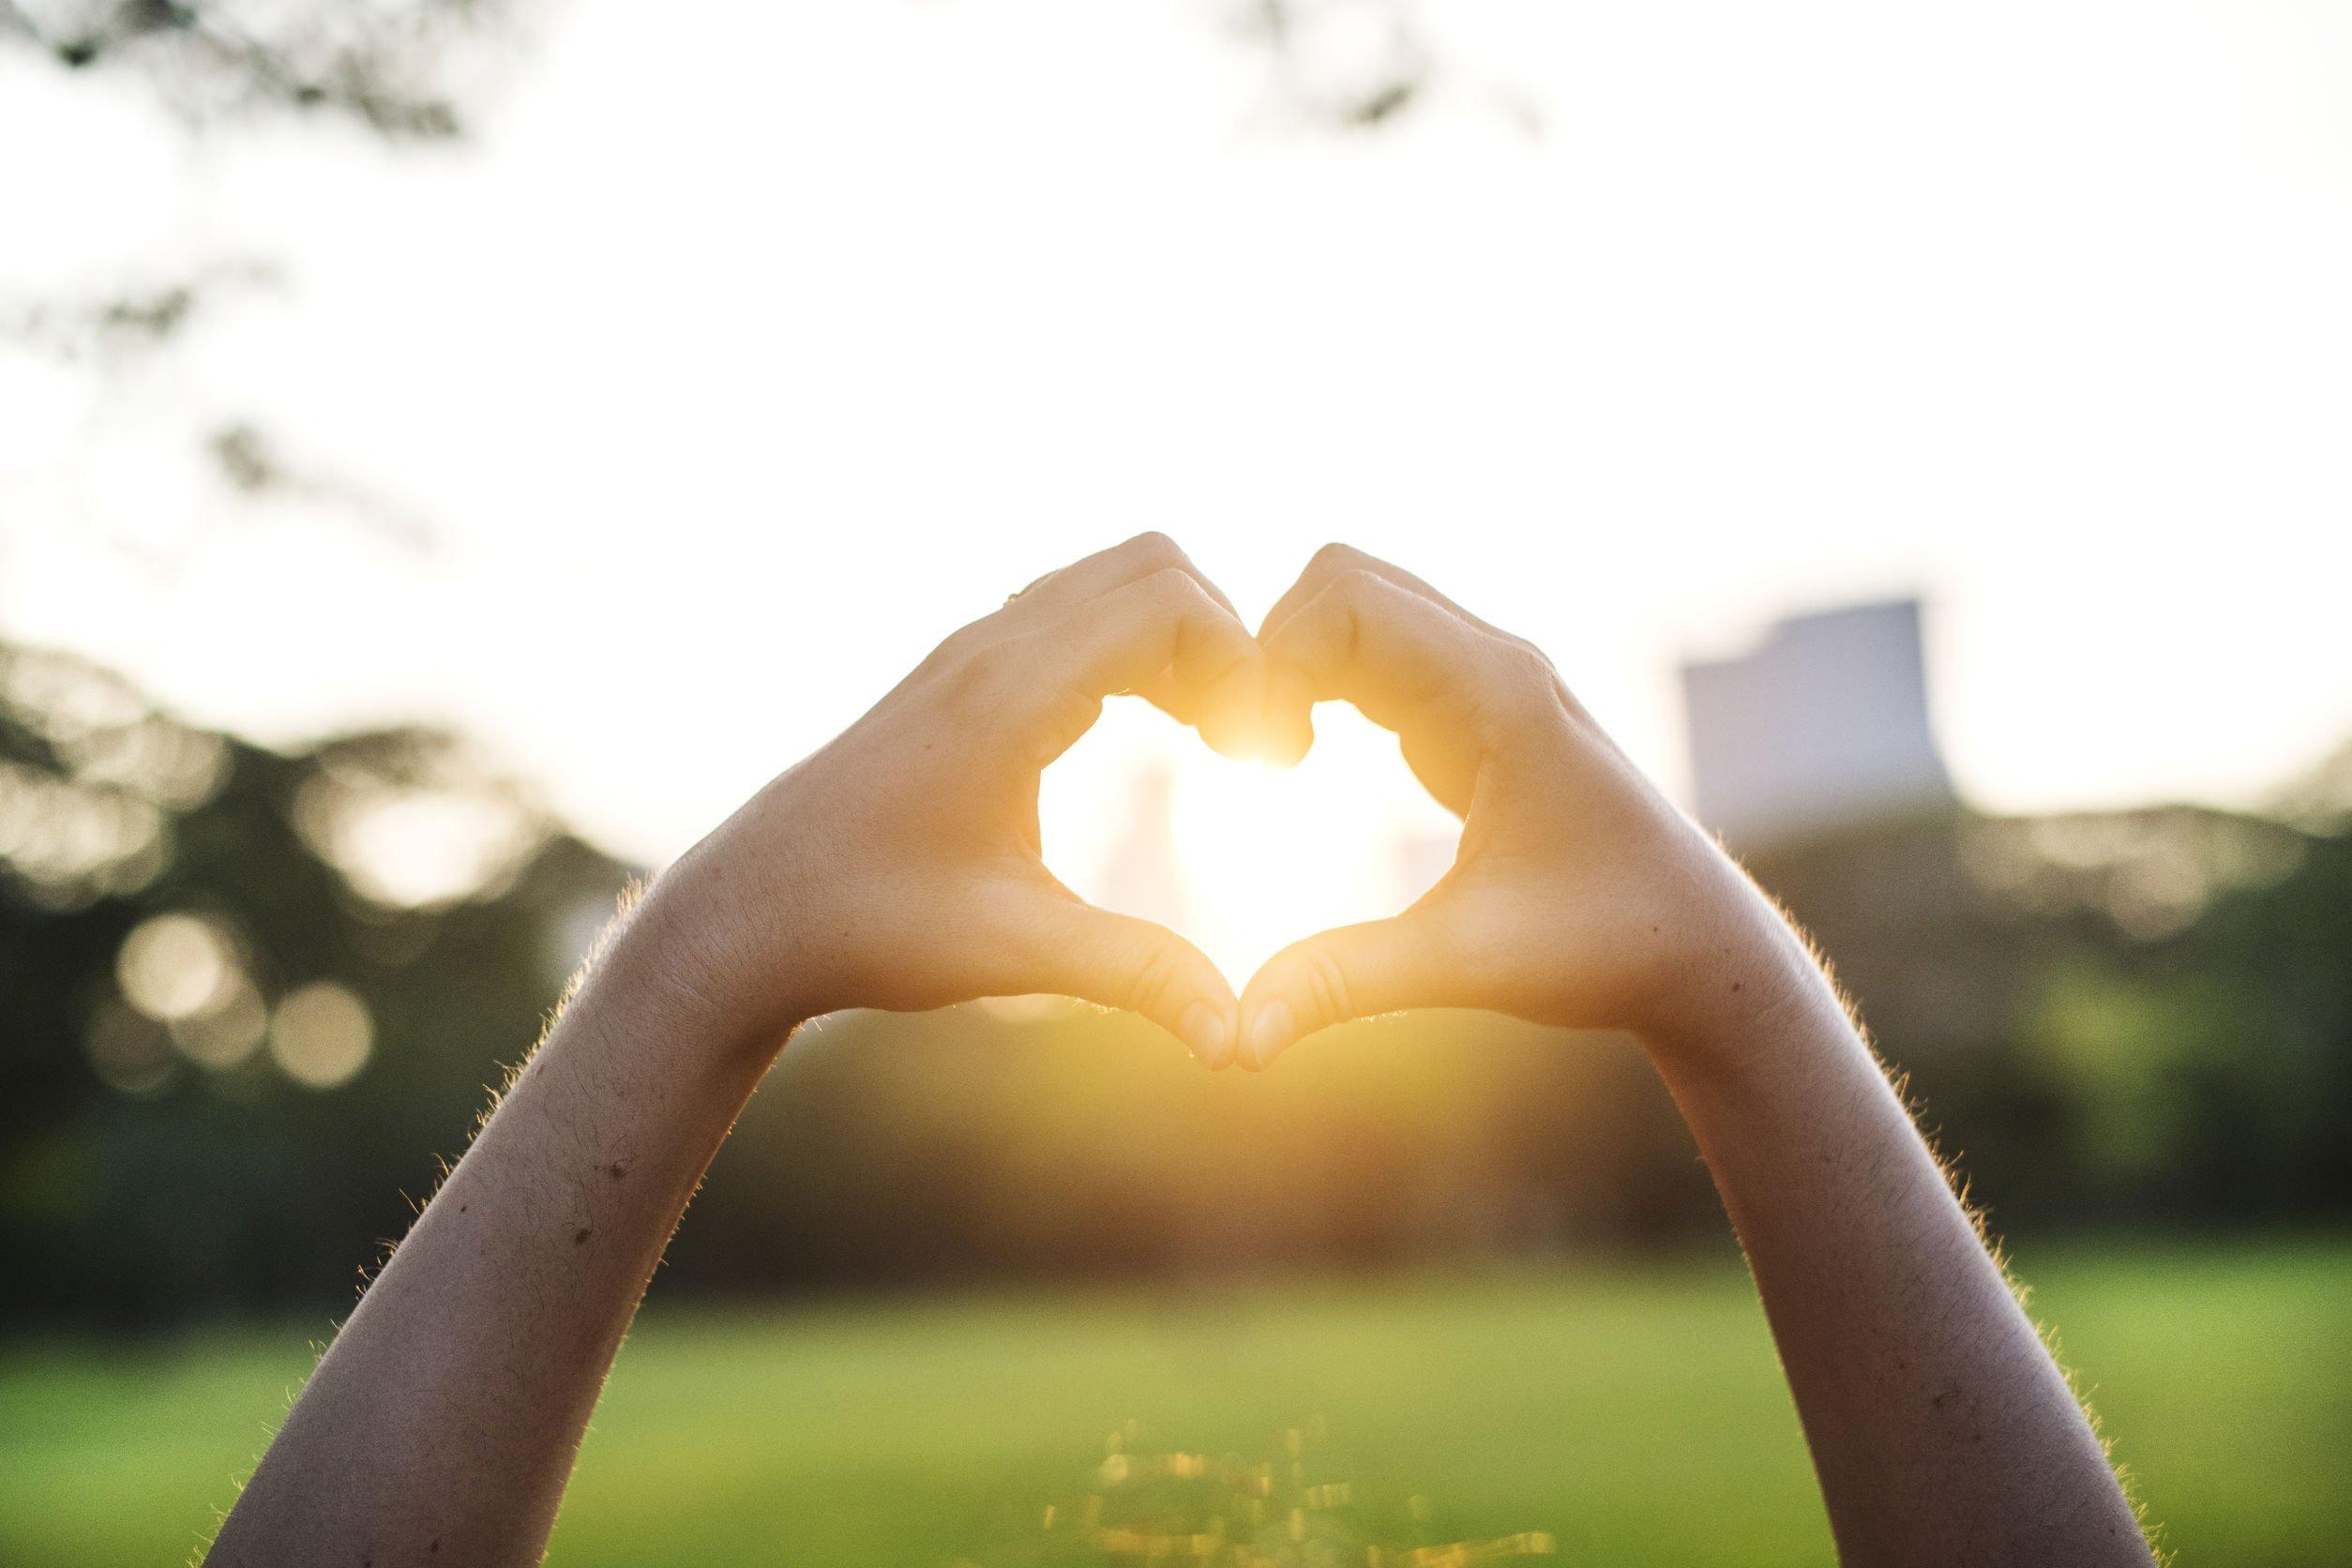 Frases De Sol Para Iluminar O Seu Dia